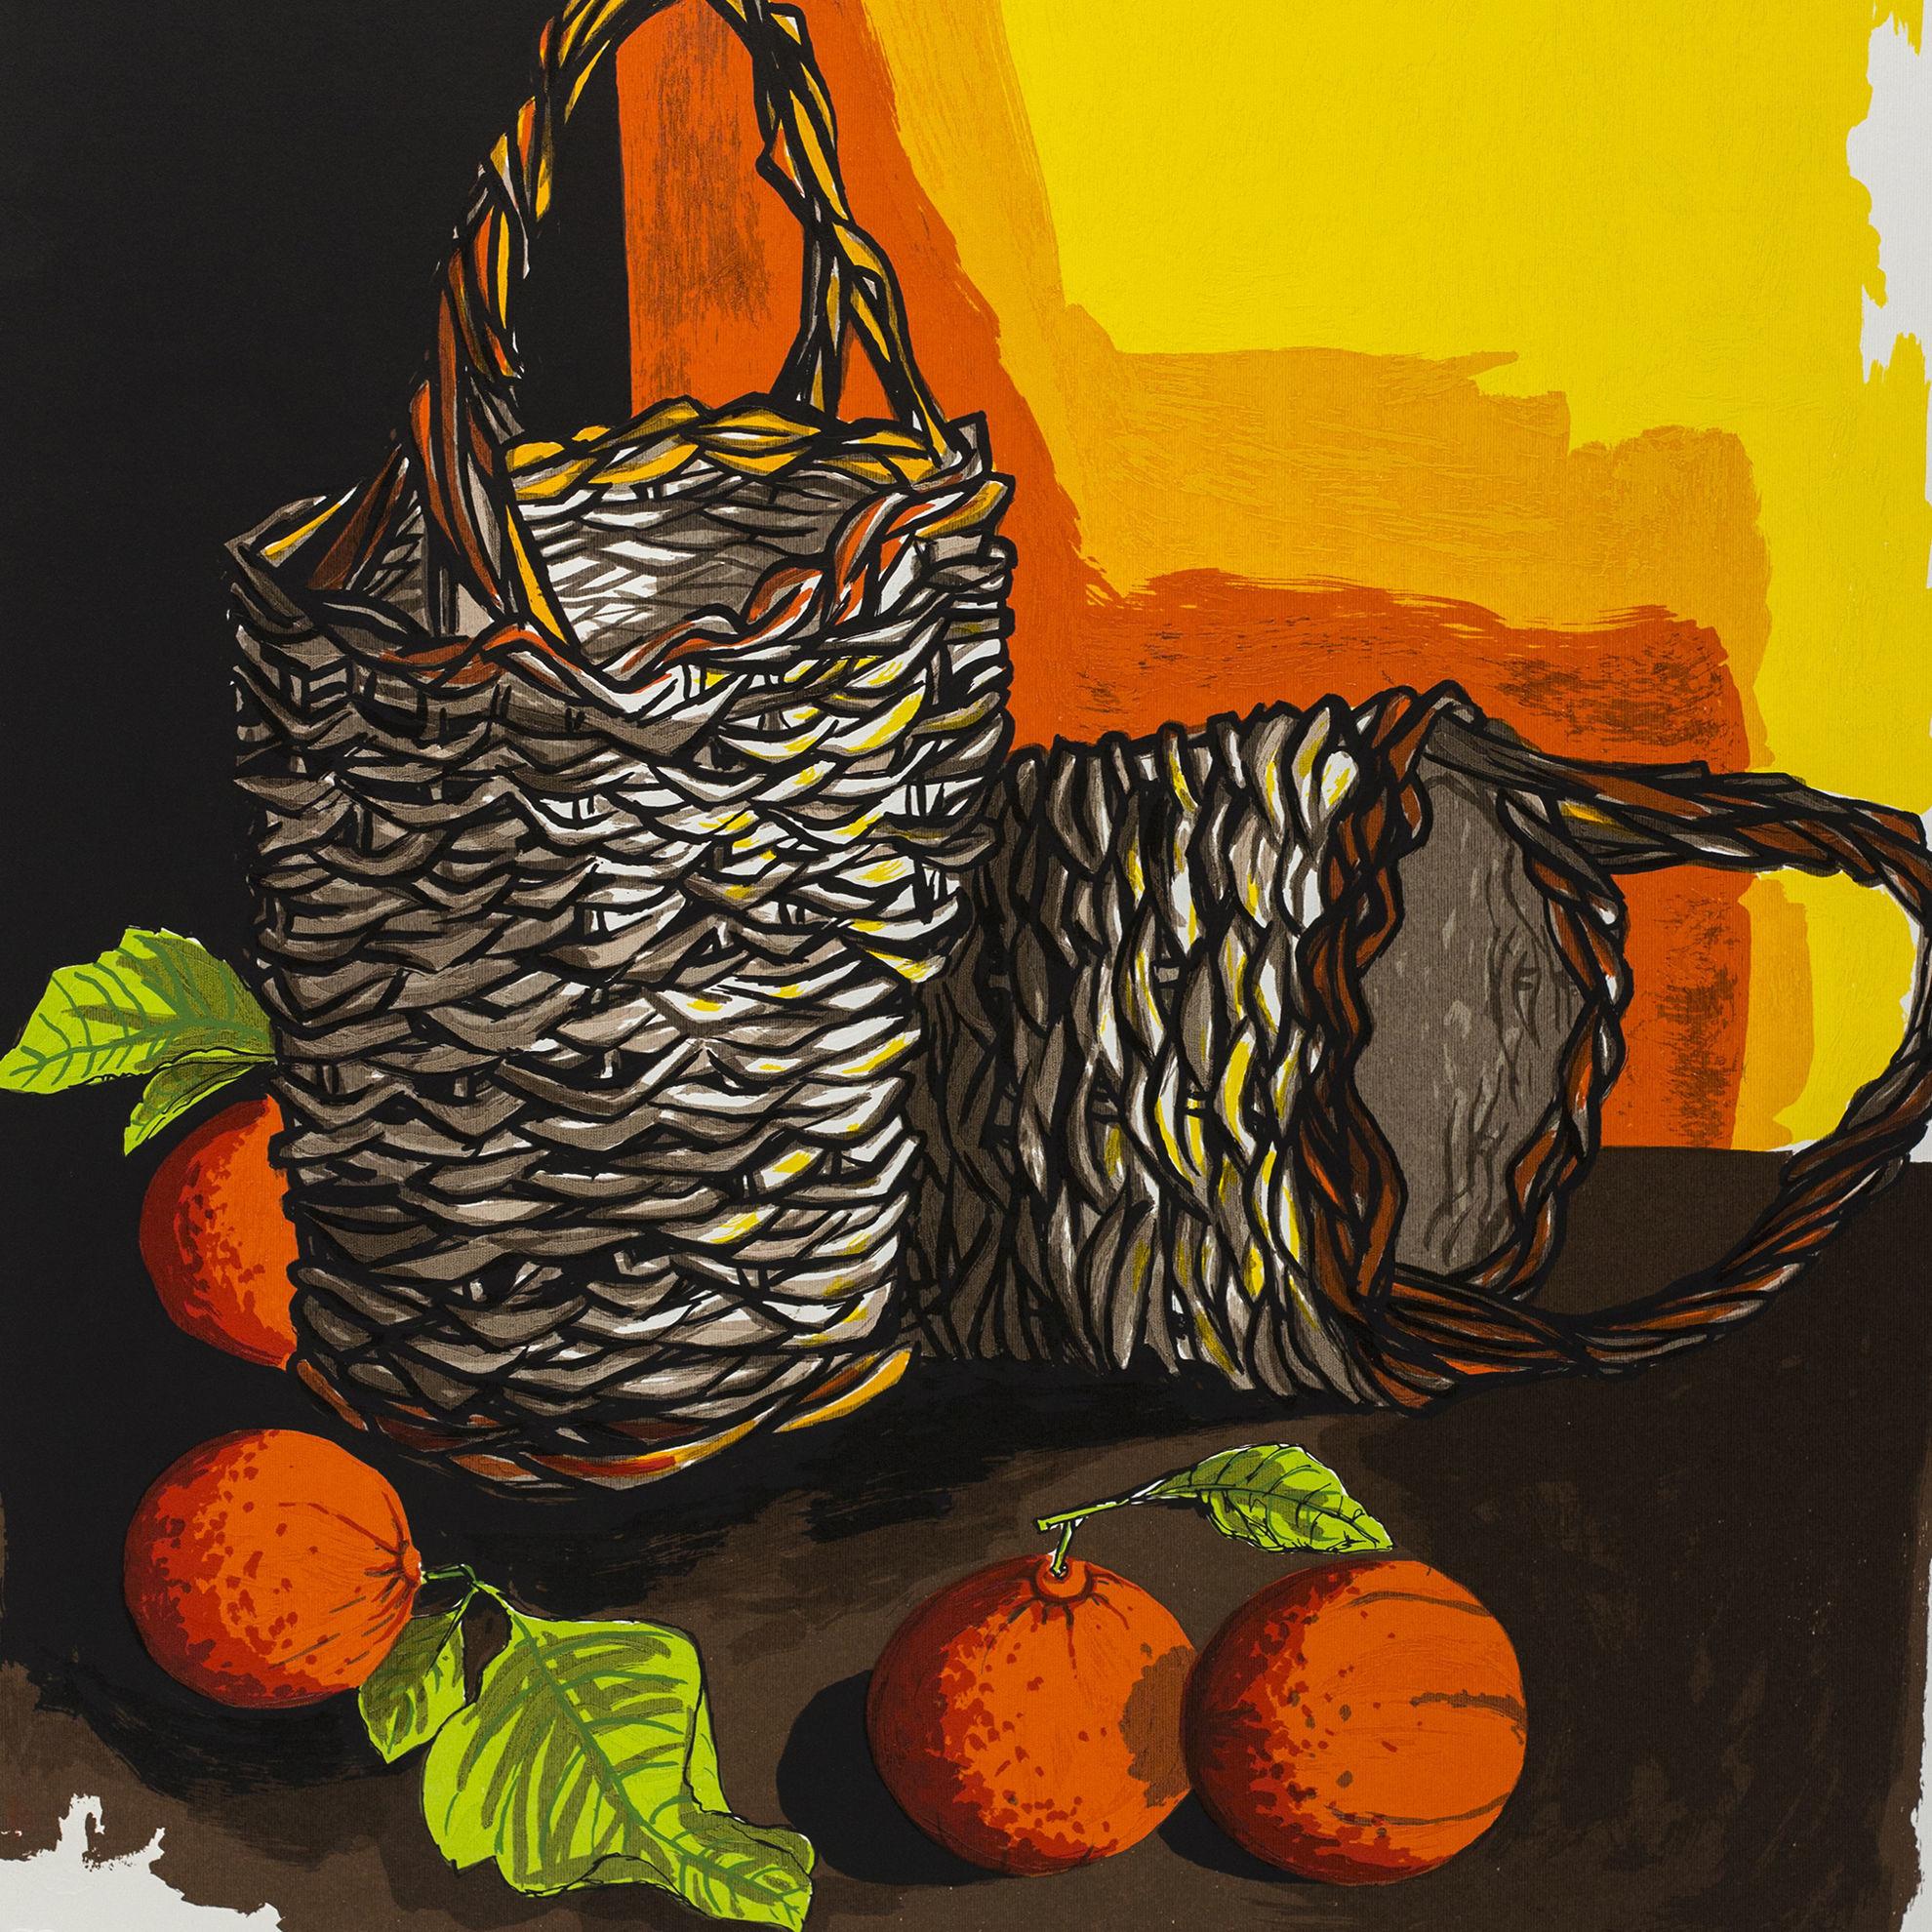 Immagine di Cesti e arance